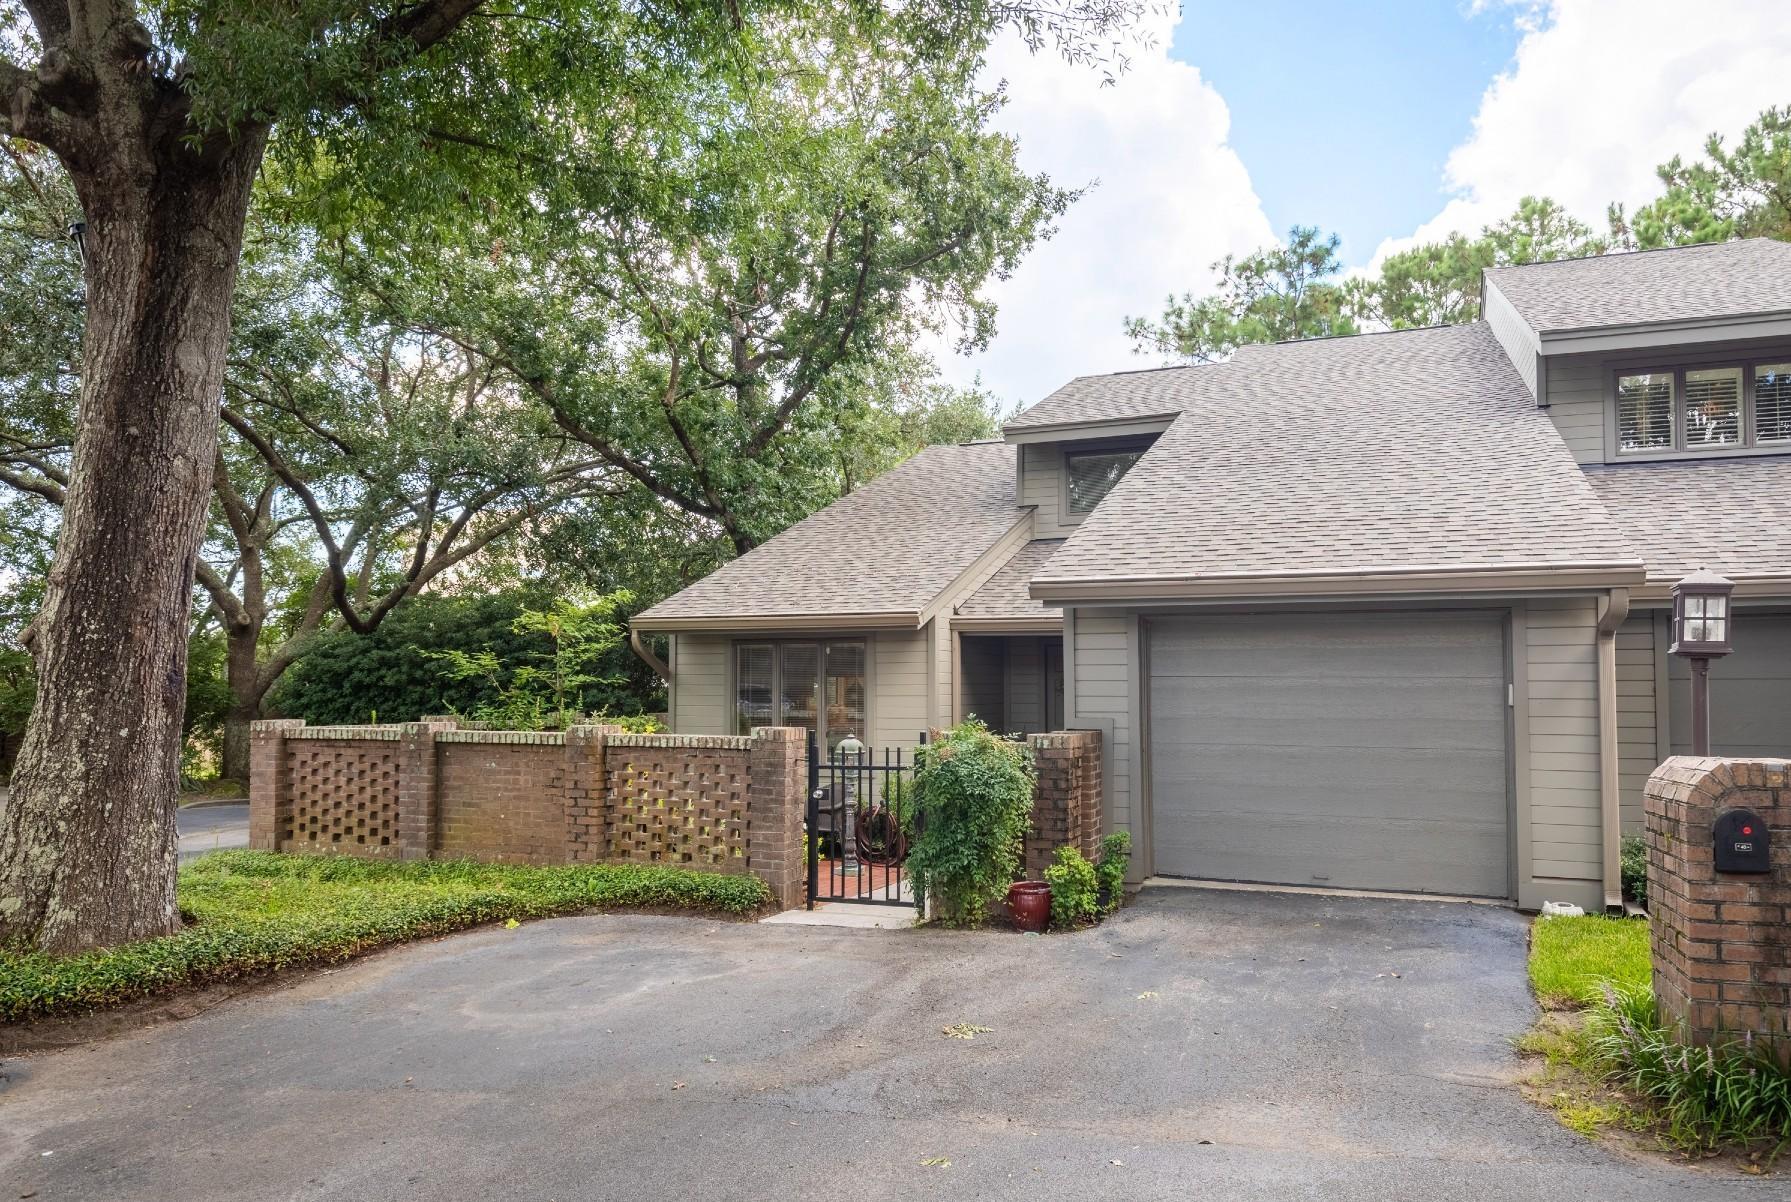 Wappoo Creek Place Homes For Sale - 40 Wappoo Creek, Charleston, SC - 12